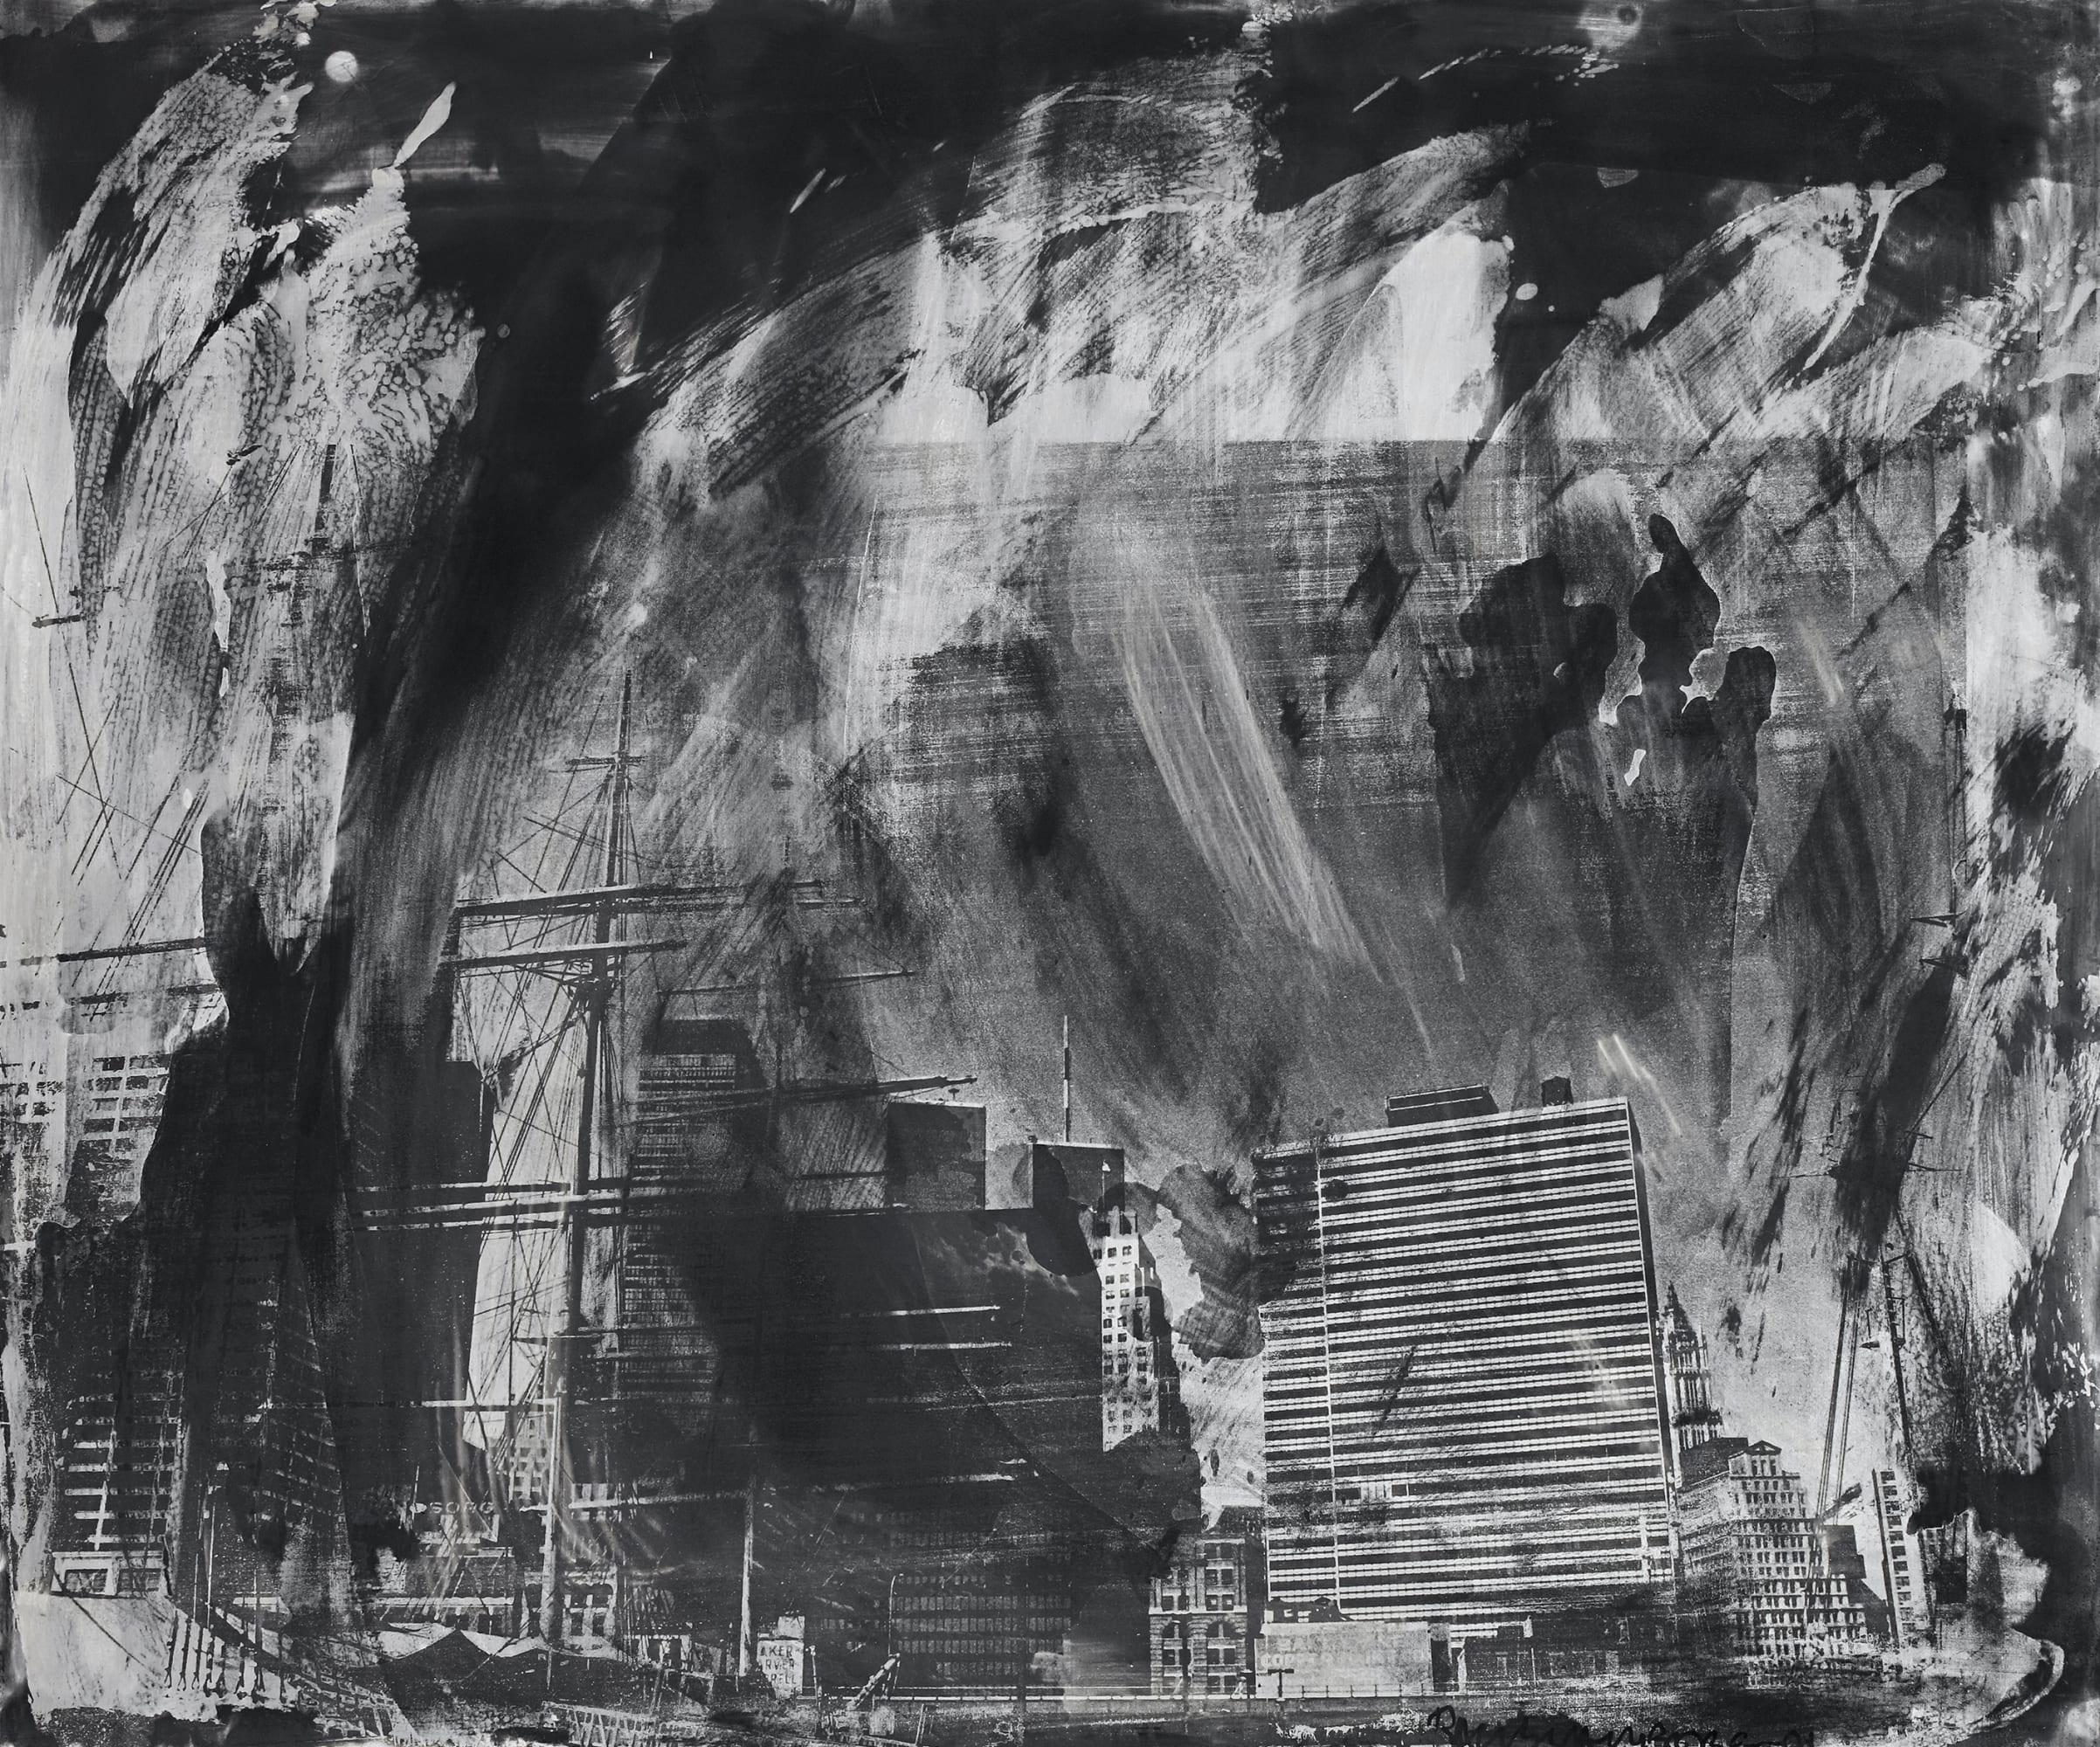 Robert Rauschenberg Night Shades and Phantoms